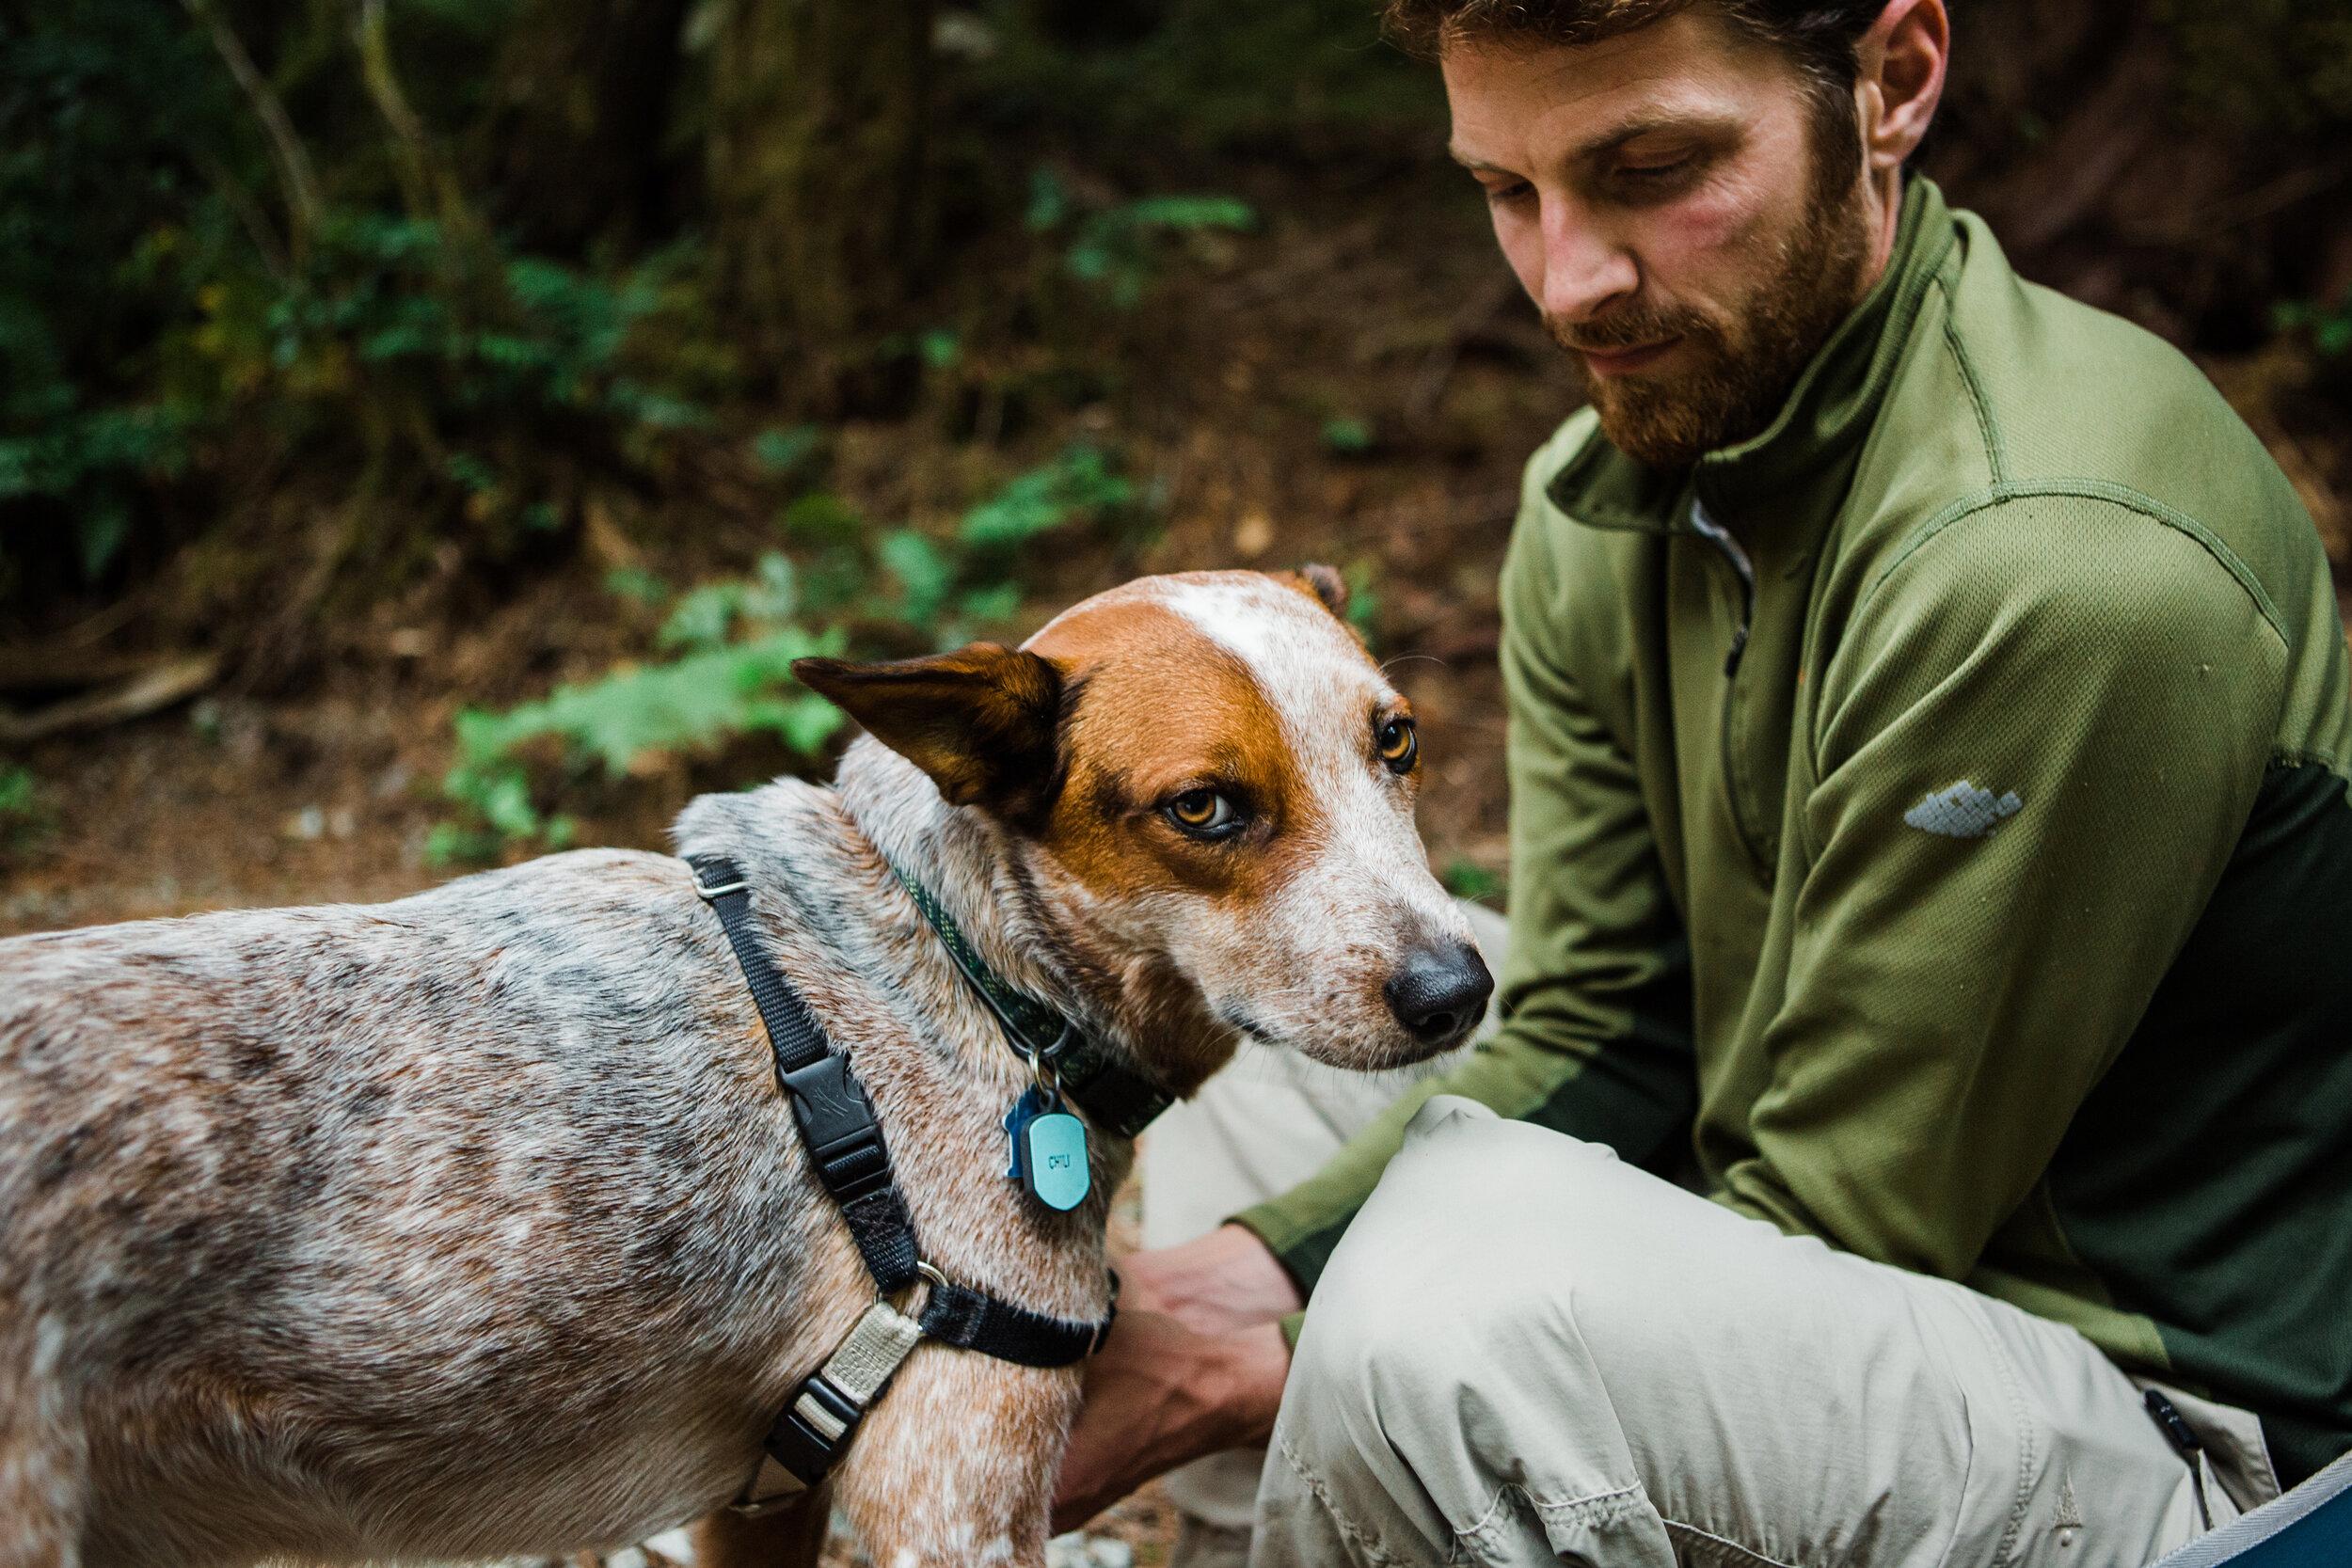 CindyGiovagnoli_North_Cascades_Washington_Nation_Park_camping_outdoors-018.jpg